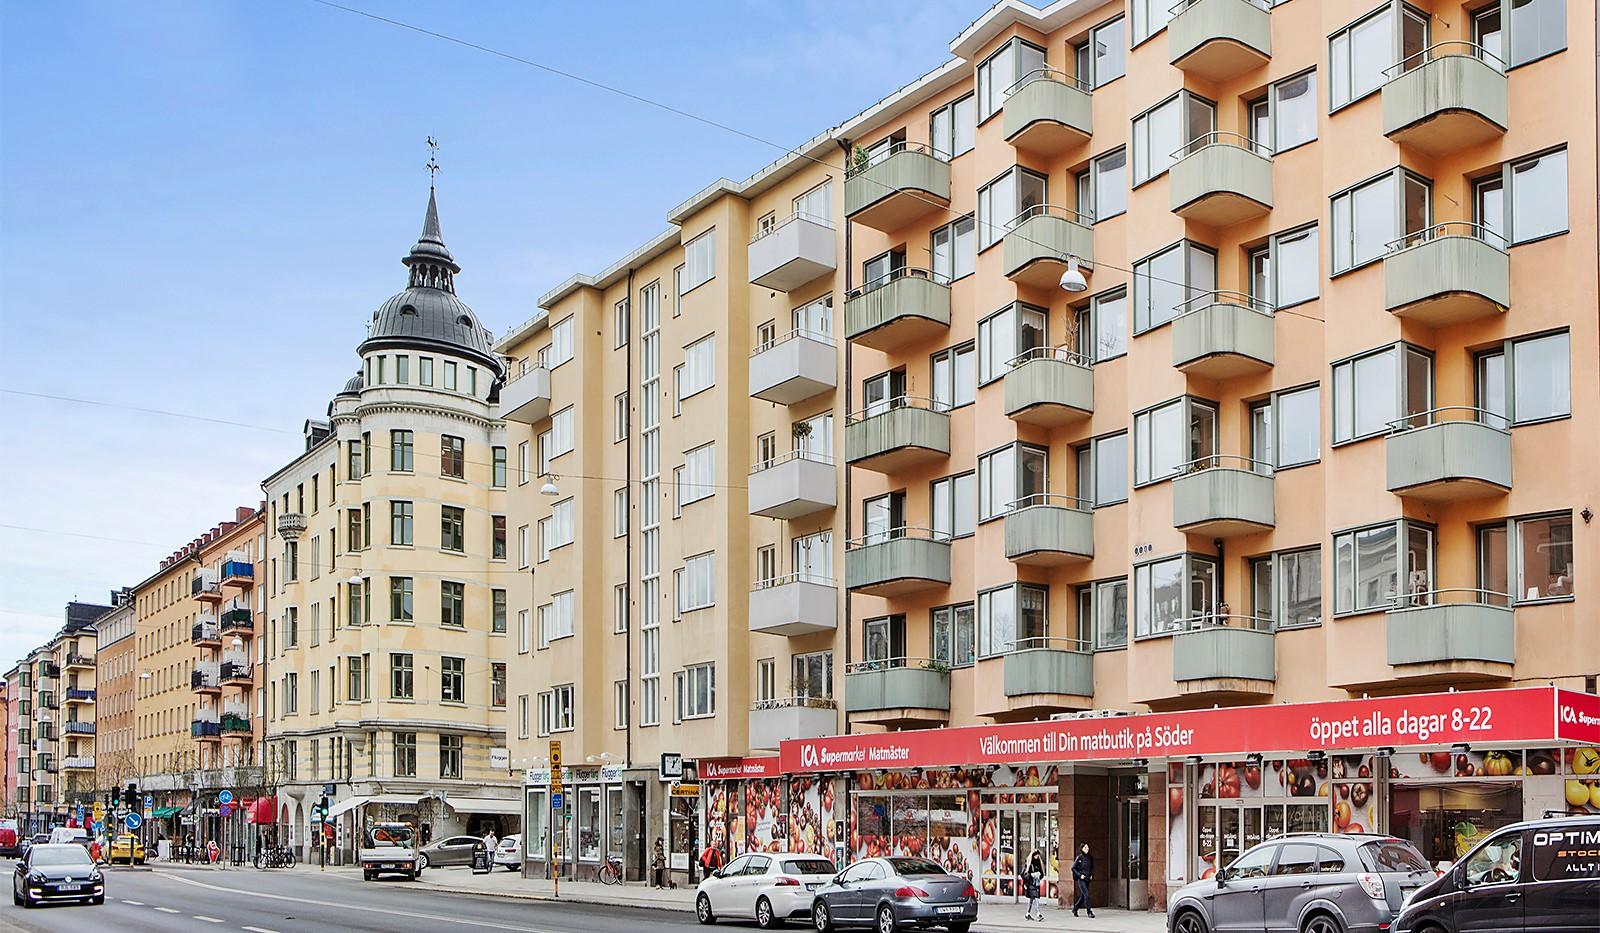 Folkungagatan 114 - Fasaden mot Folkungagatan